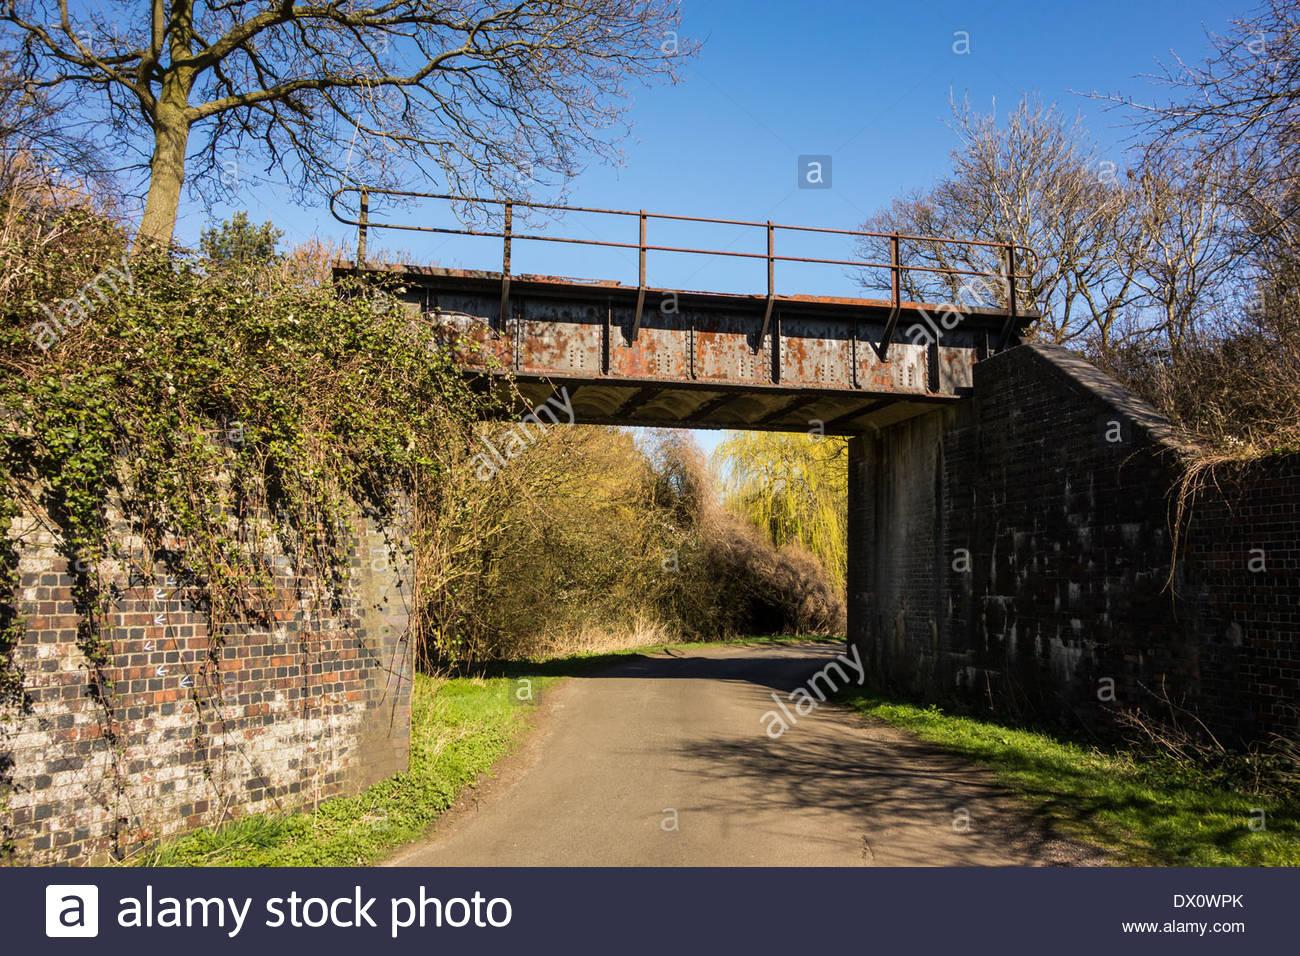 Bridge, now redundant, for the disused railway line between Huntingdon and Kettering, England, UK - Stock Image